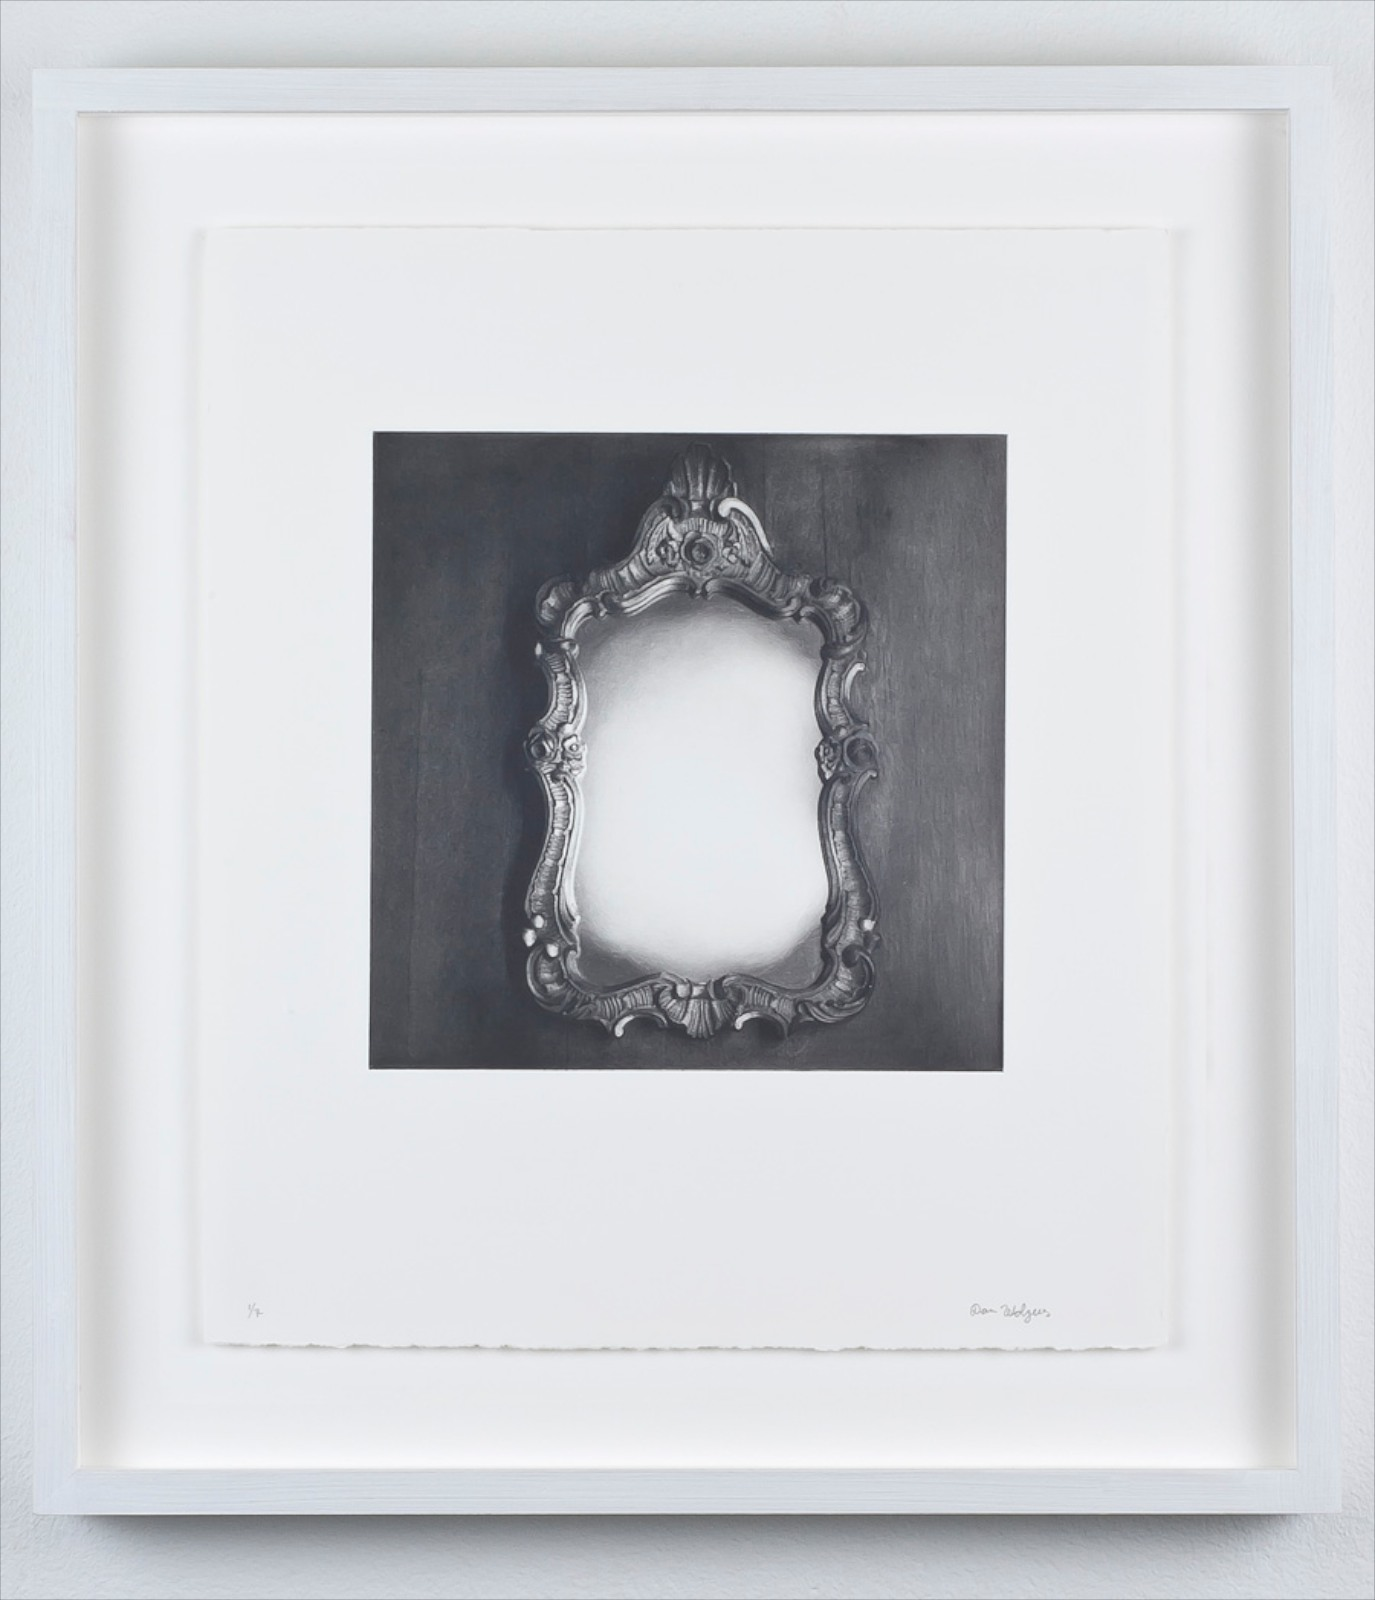 Hidden from view (empty mirror), 2011, photogravure, 31 x 27.8 cm